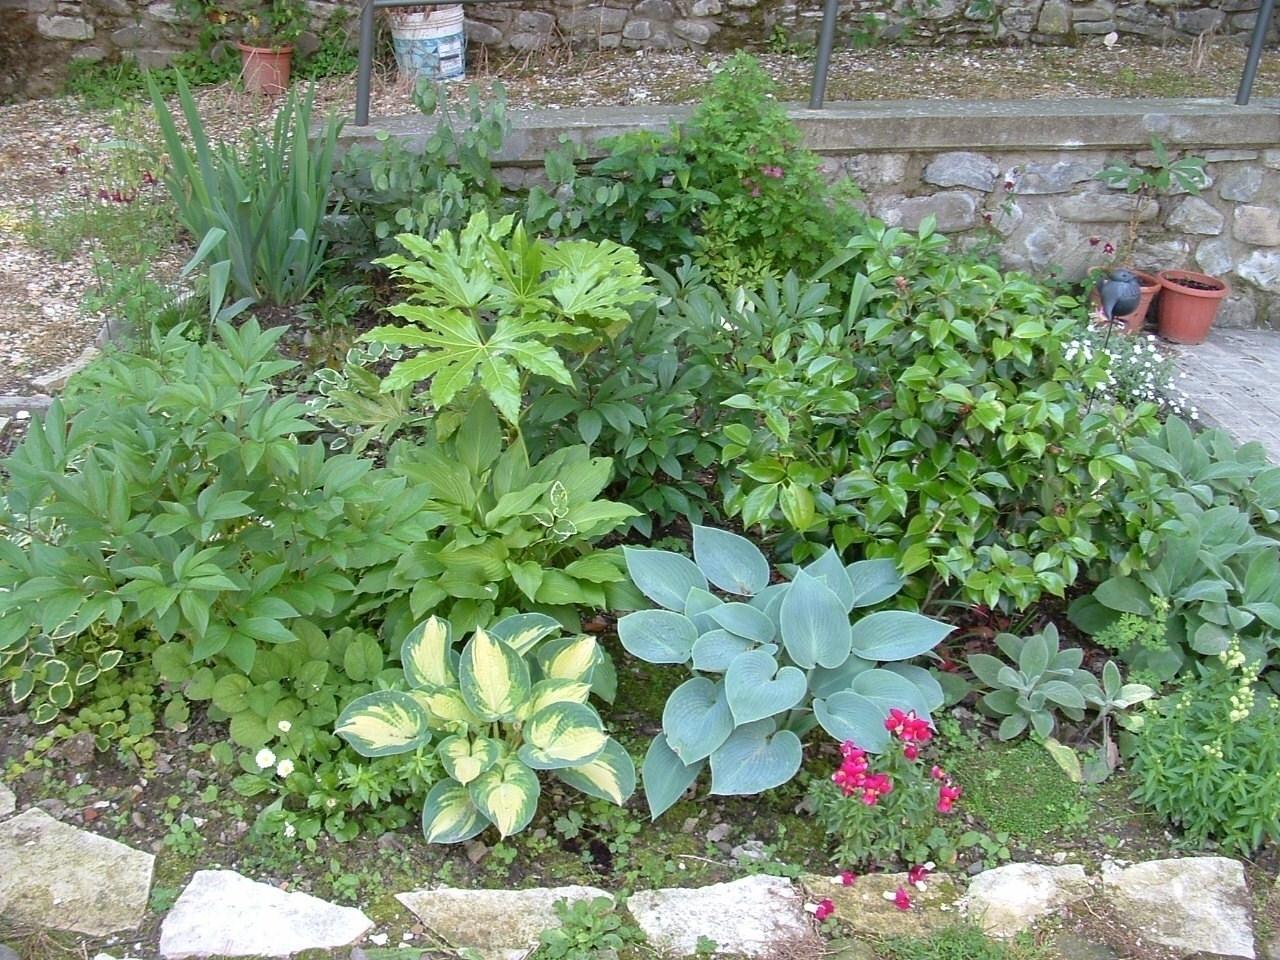 Piante nane piante da terrazzo piante nane appartamento - Palme nane da giardino ...